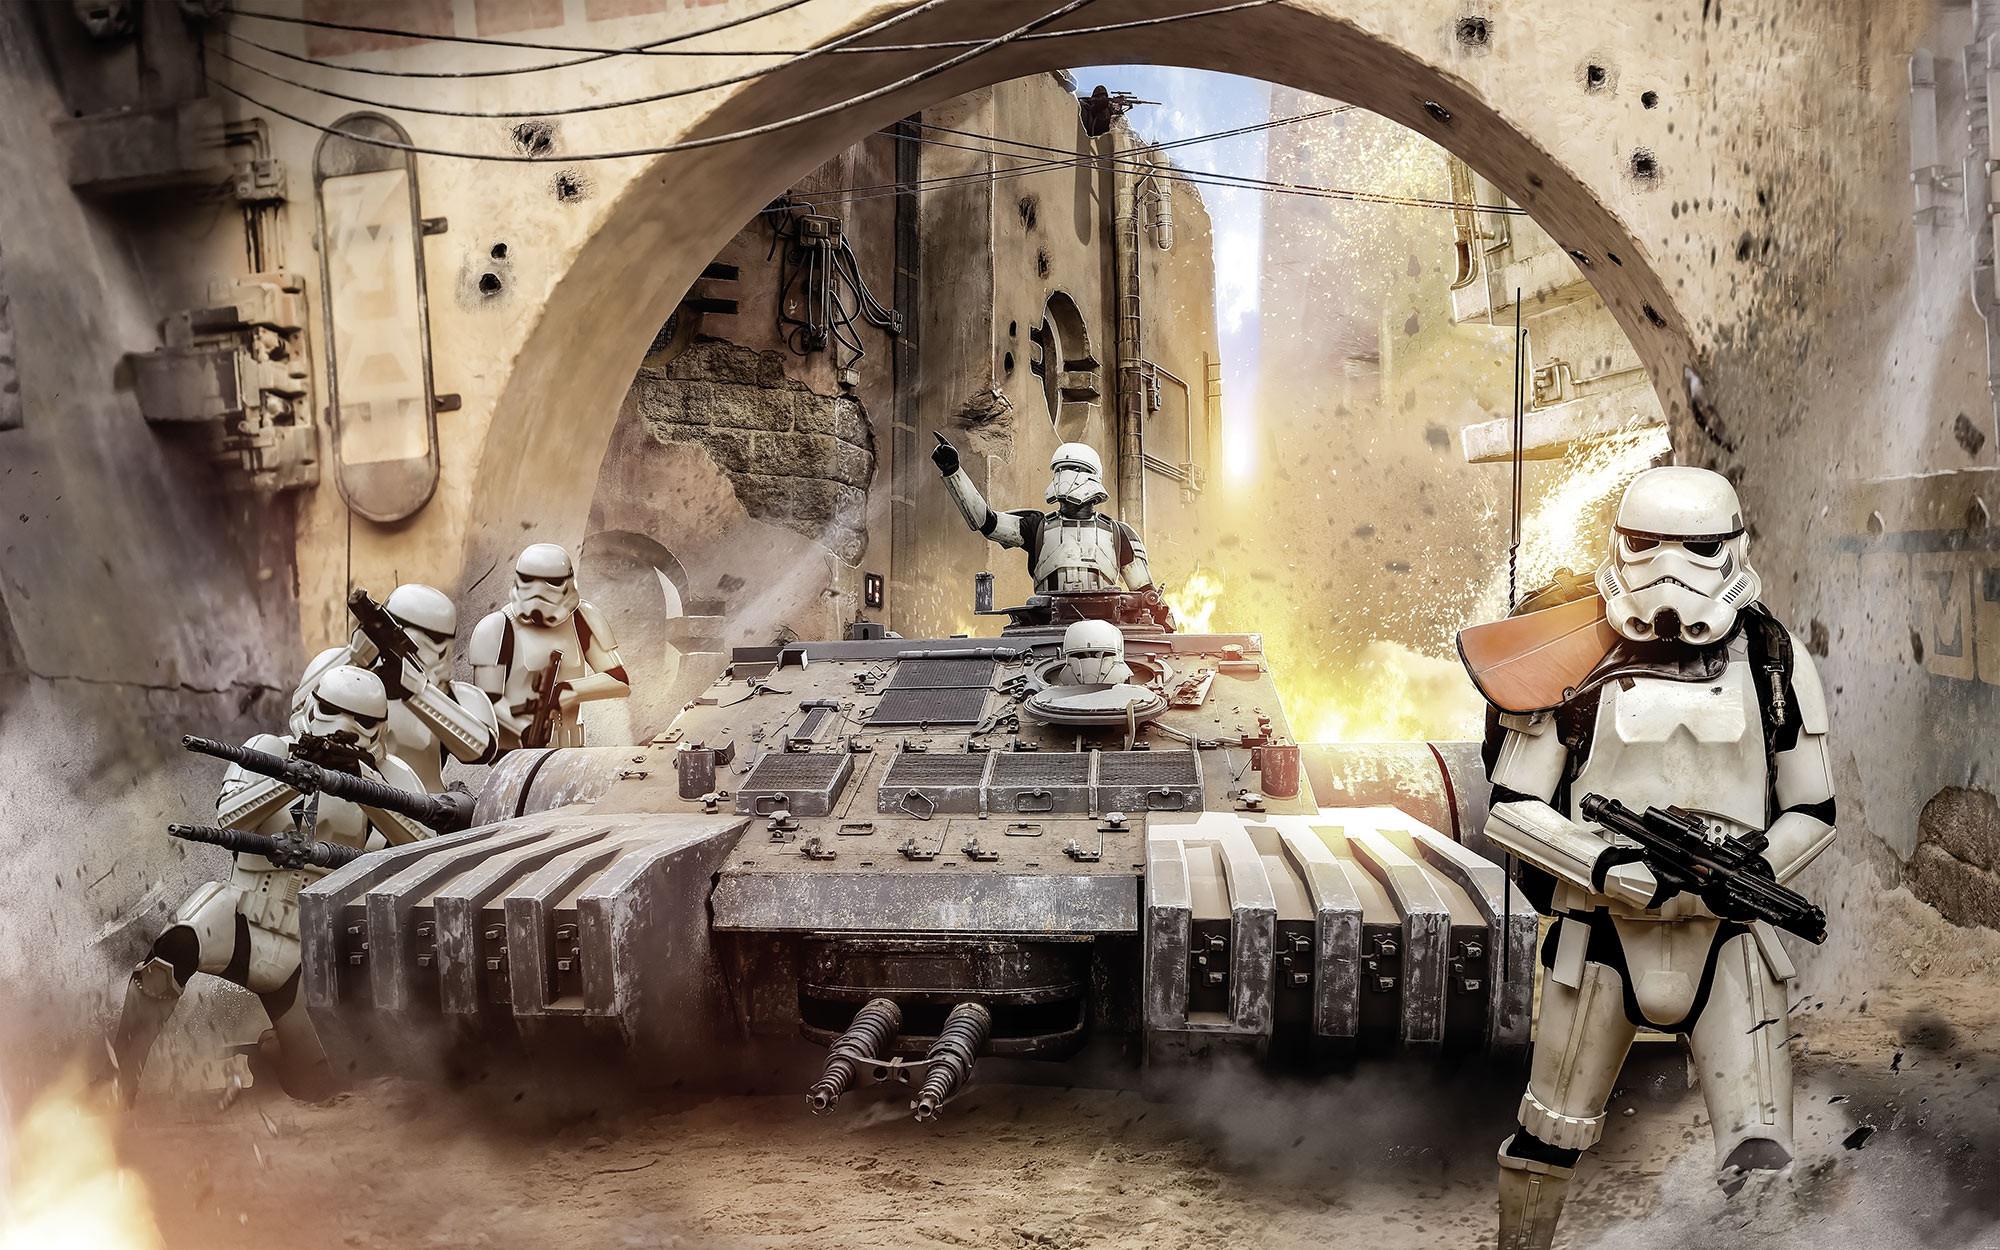 Star Wars Tanktrooper